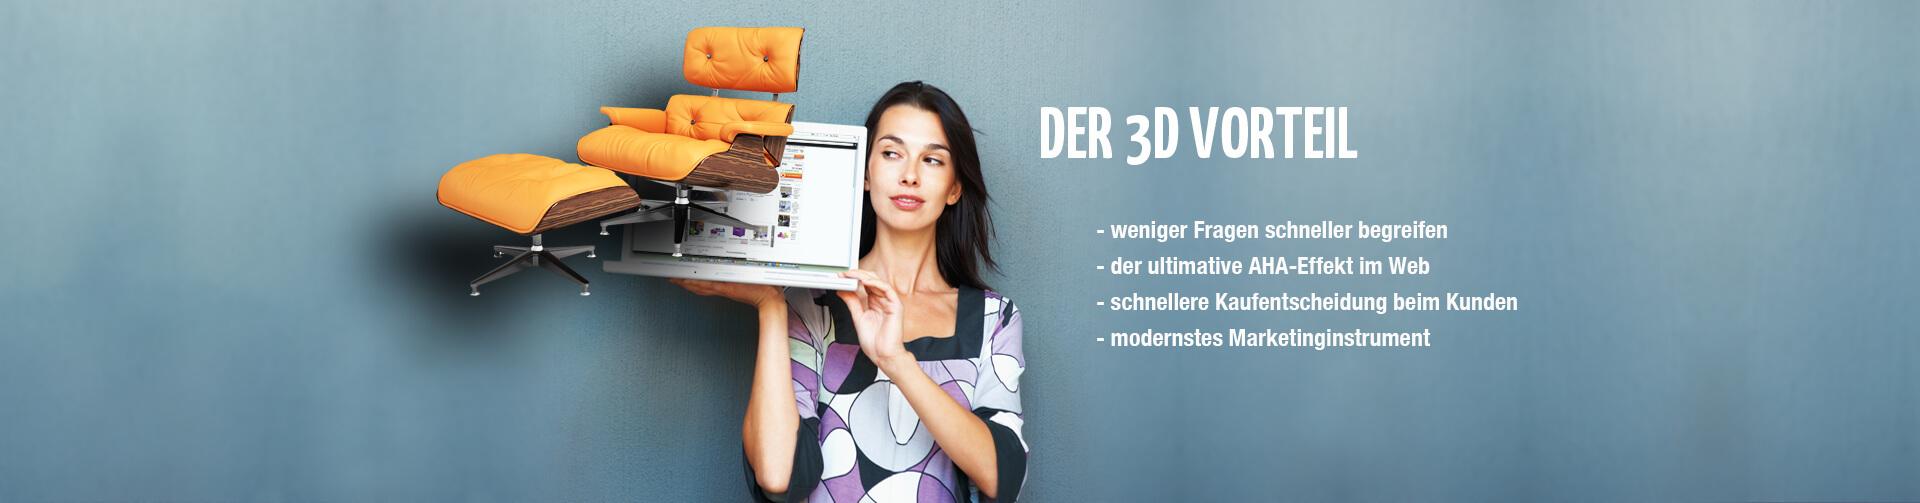 ikea s 3d konfigurator 3d magazin. Black Bedroom Furniture Sets. Home Design Ideas